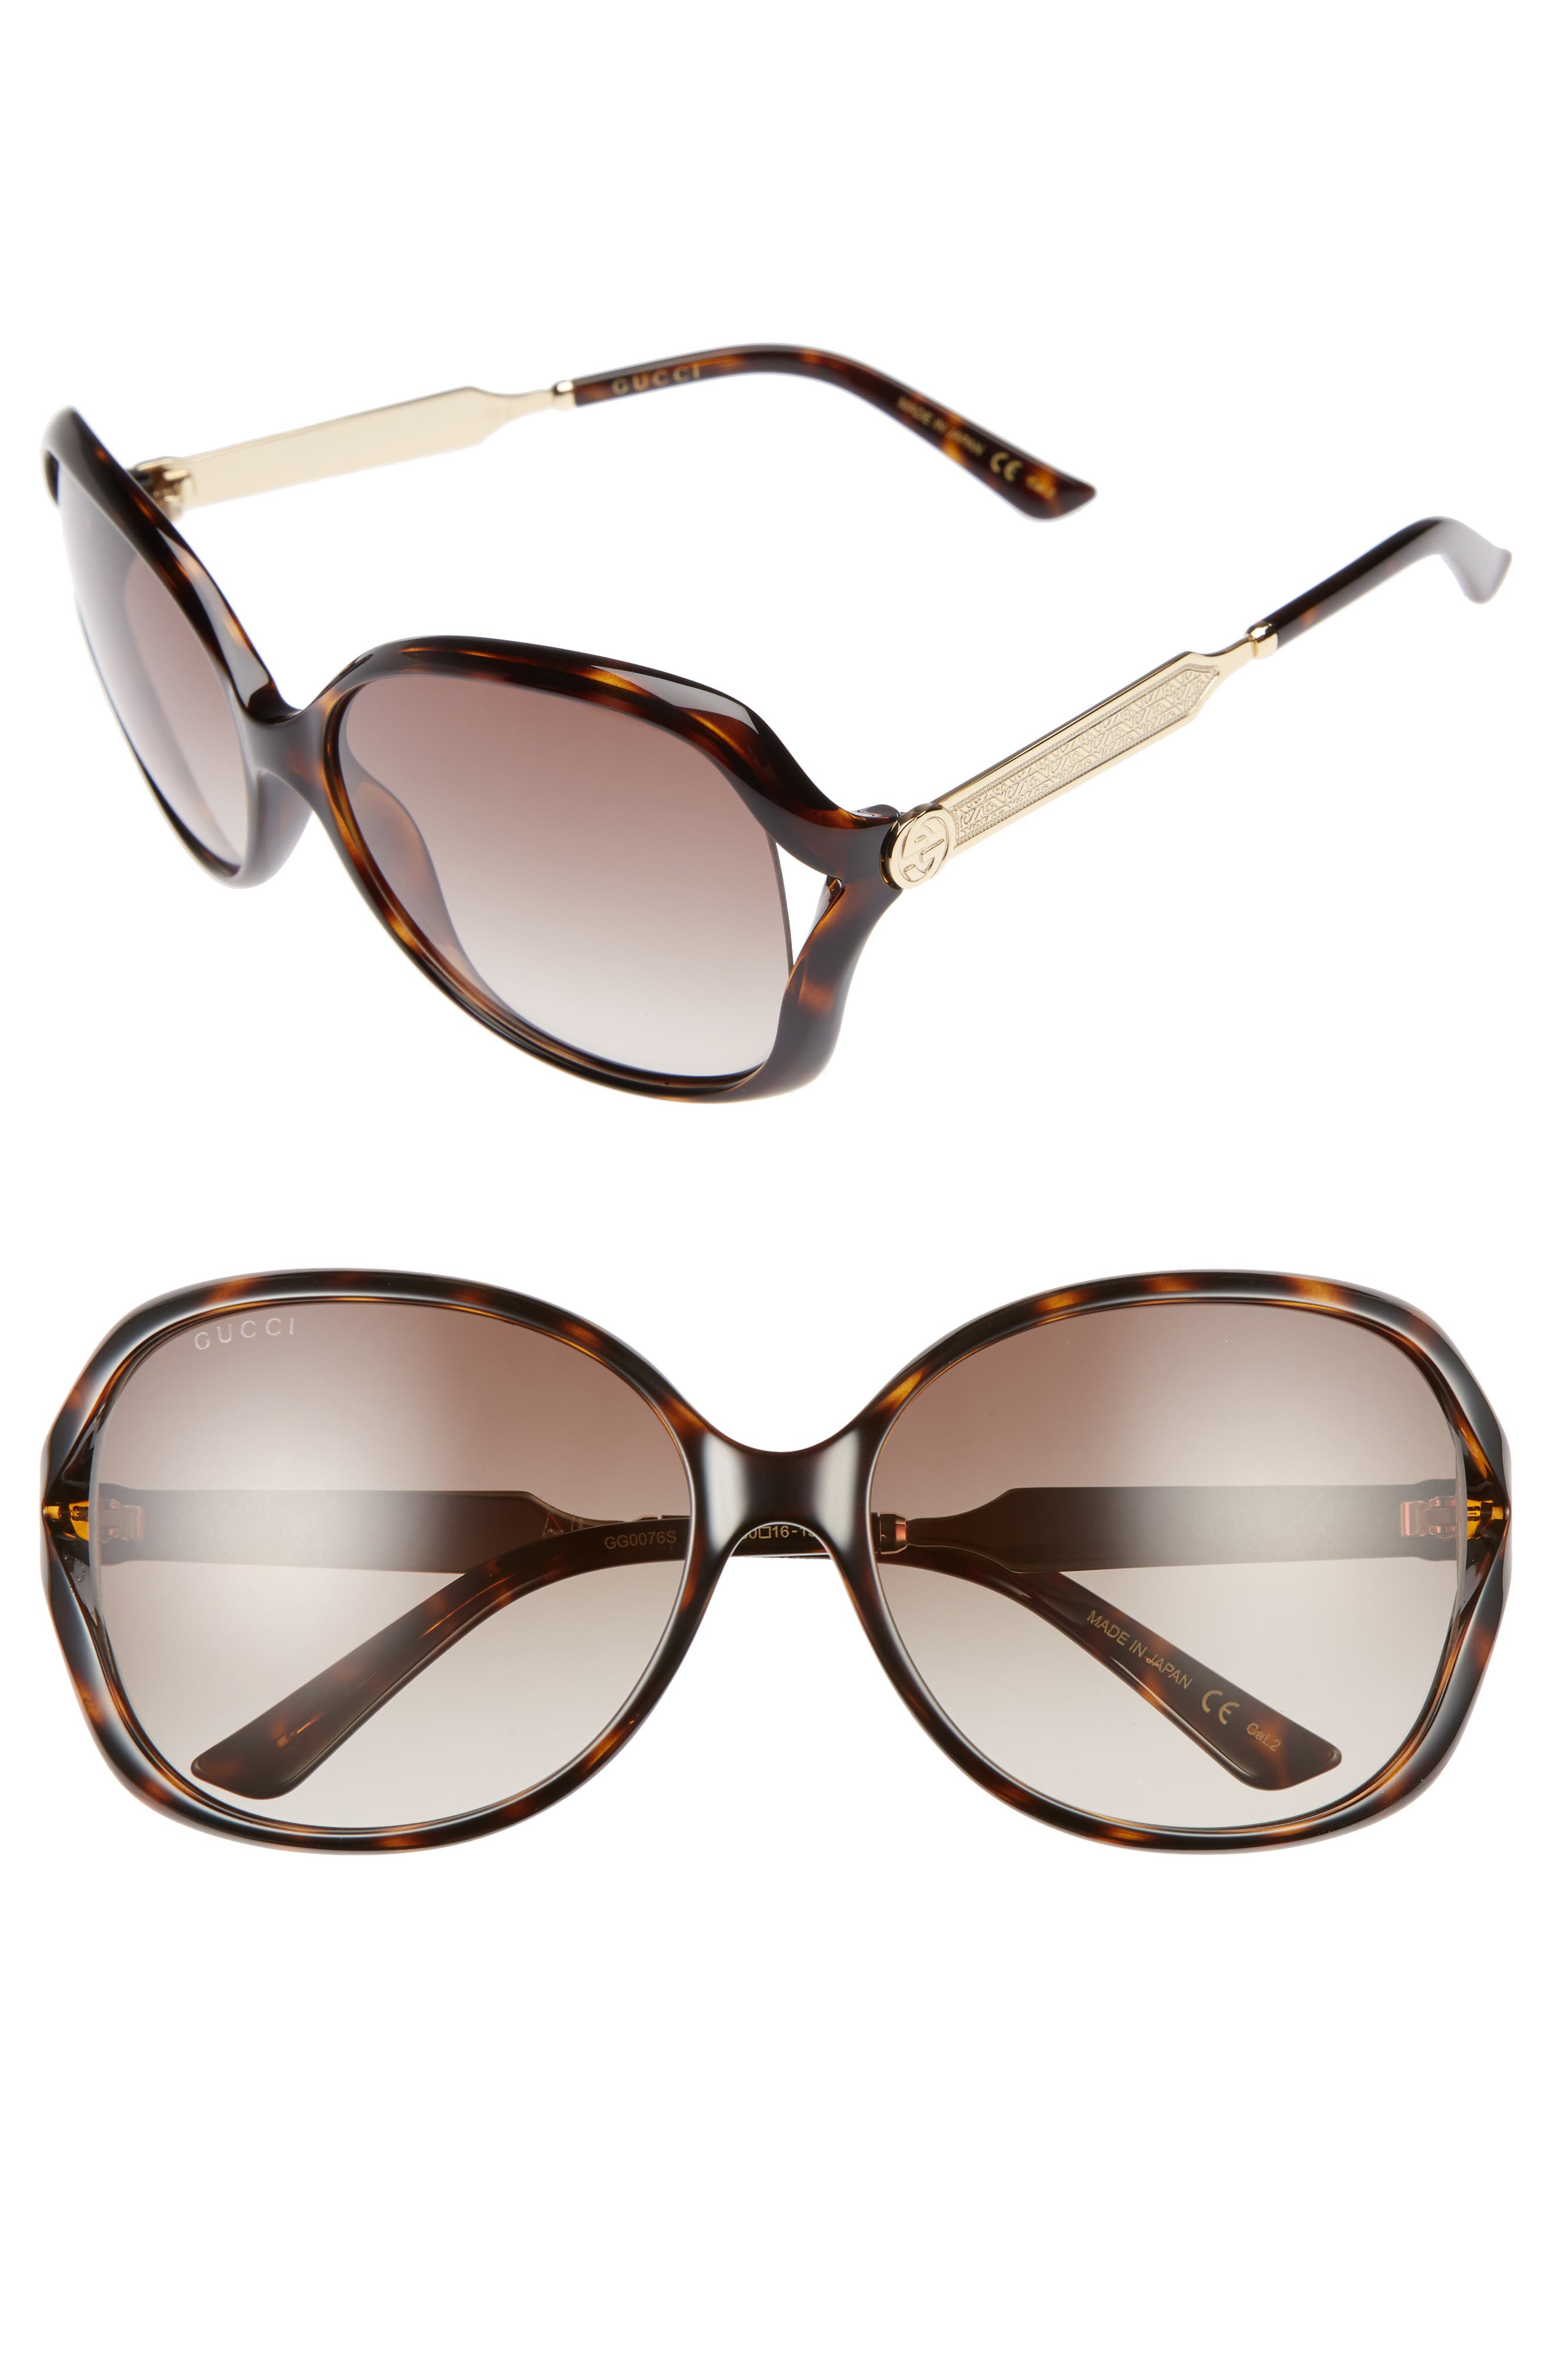 60mm Open Temple Oval Sunglasses,                             Main thumbnail 1, color,                             HAVANA/ BROWN